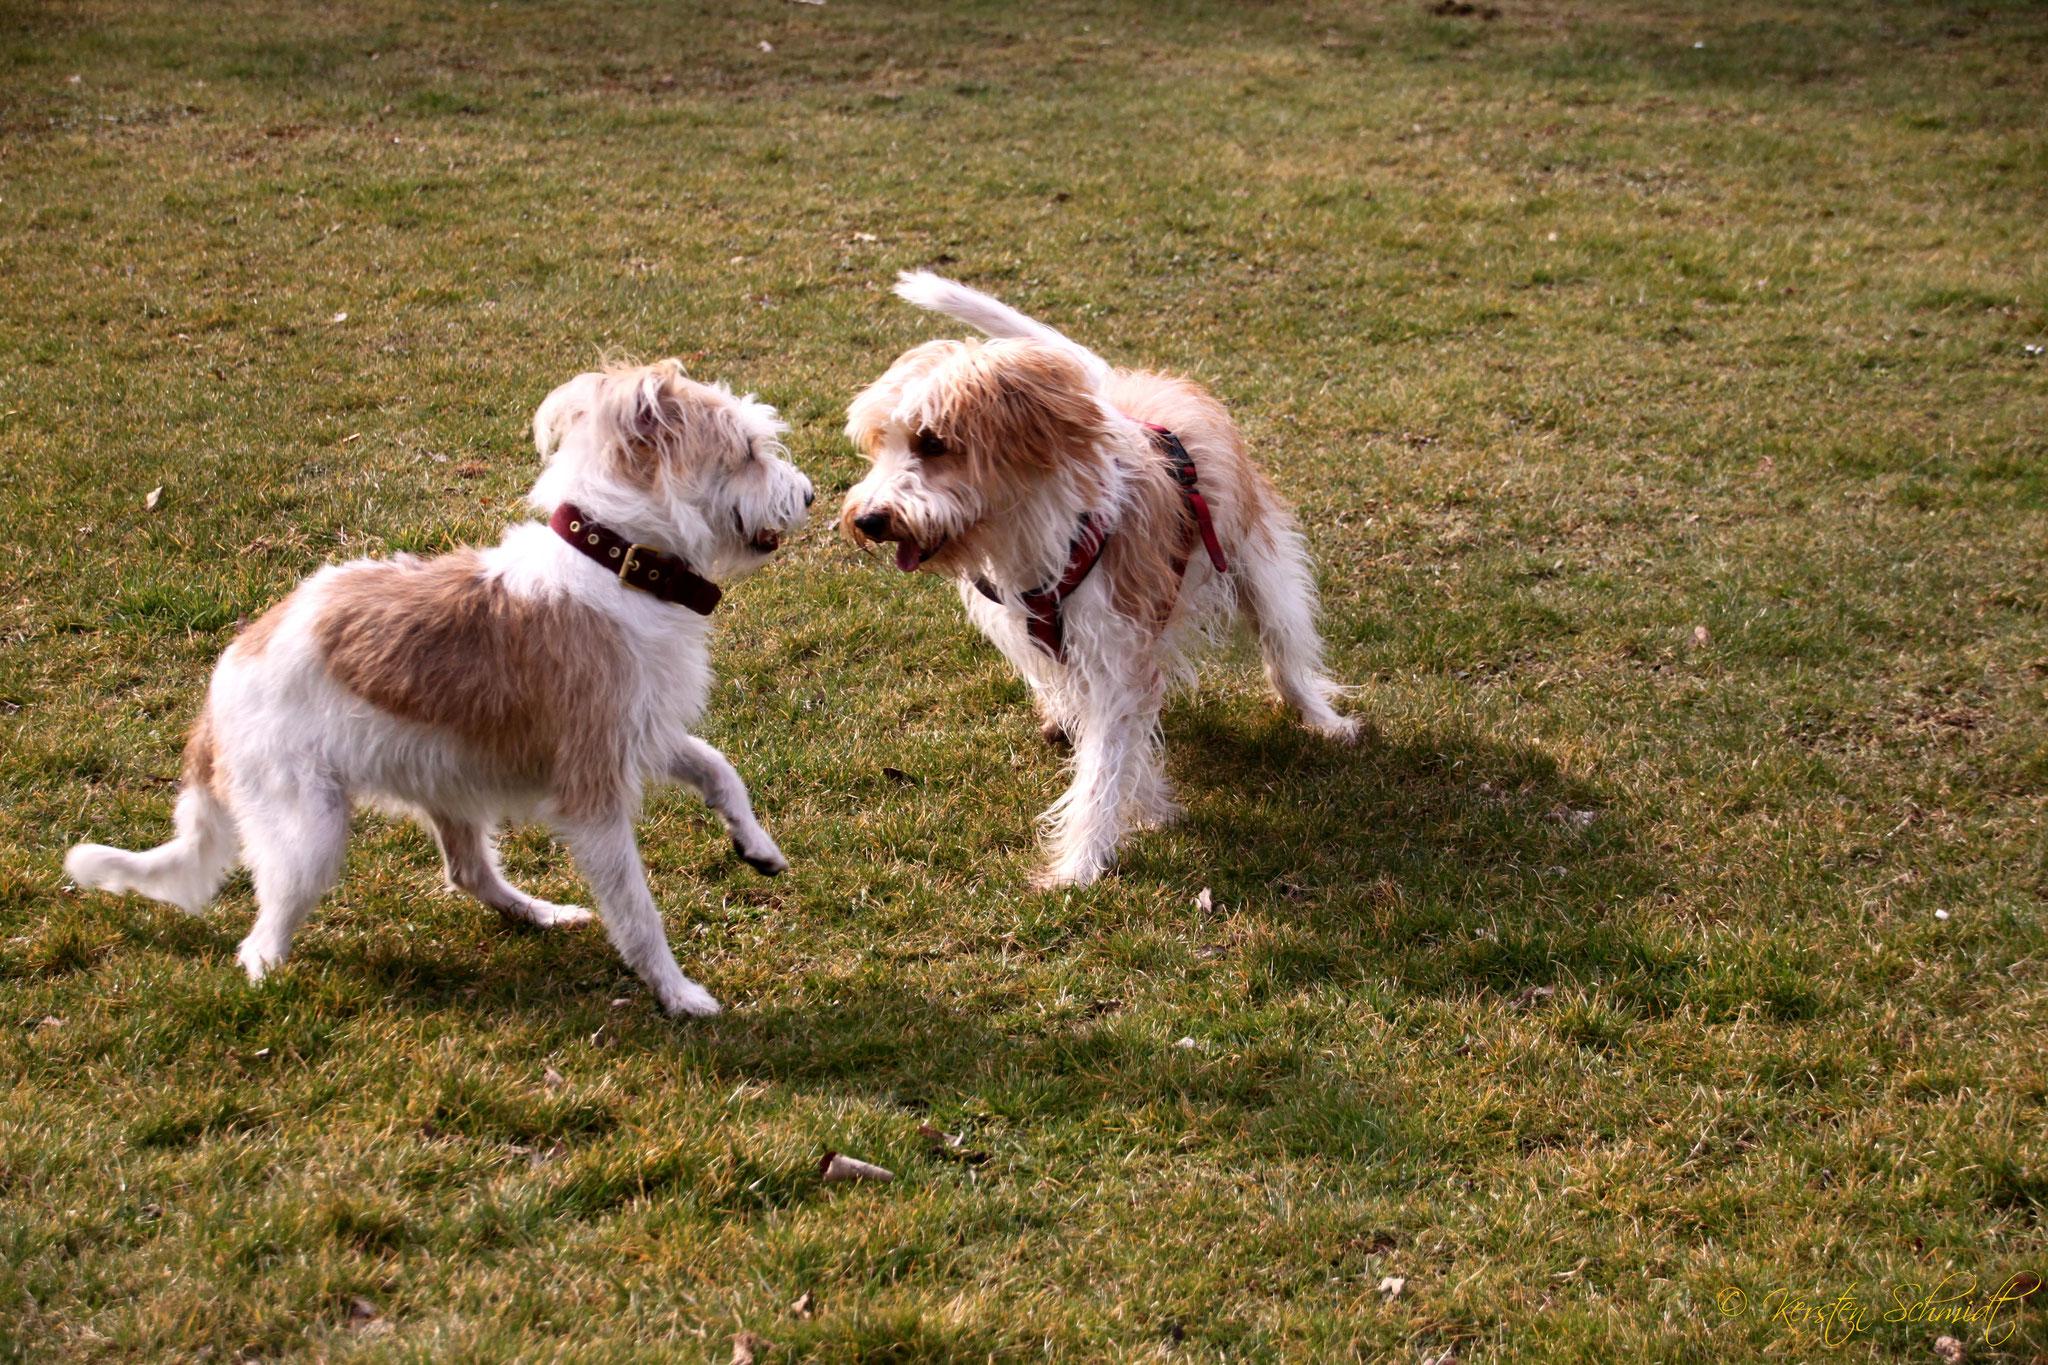 Cataleya & Benny